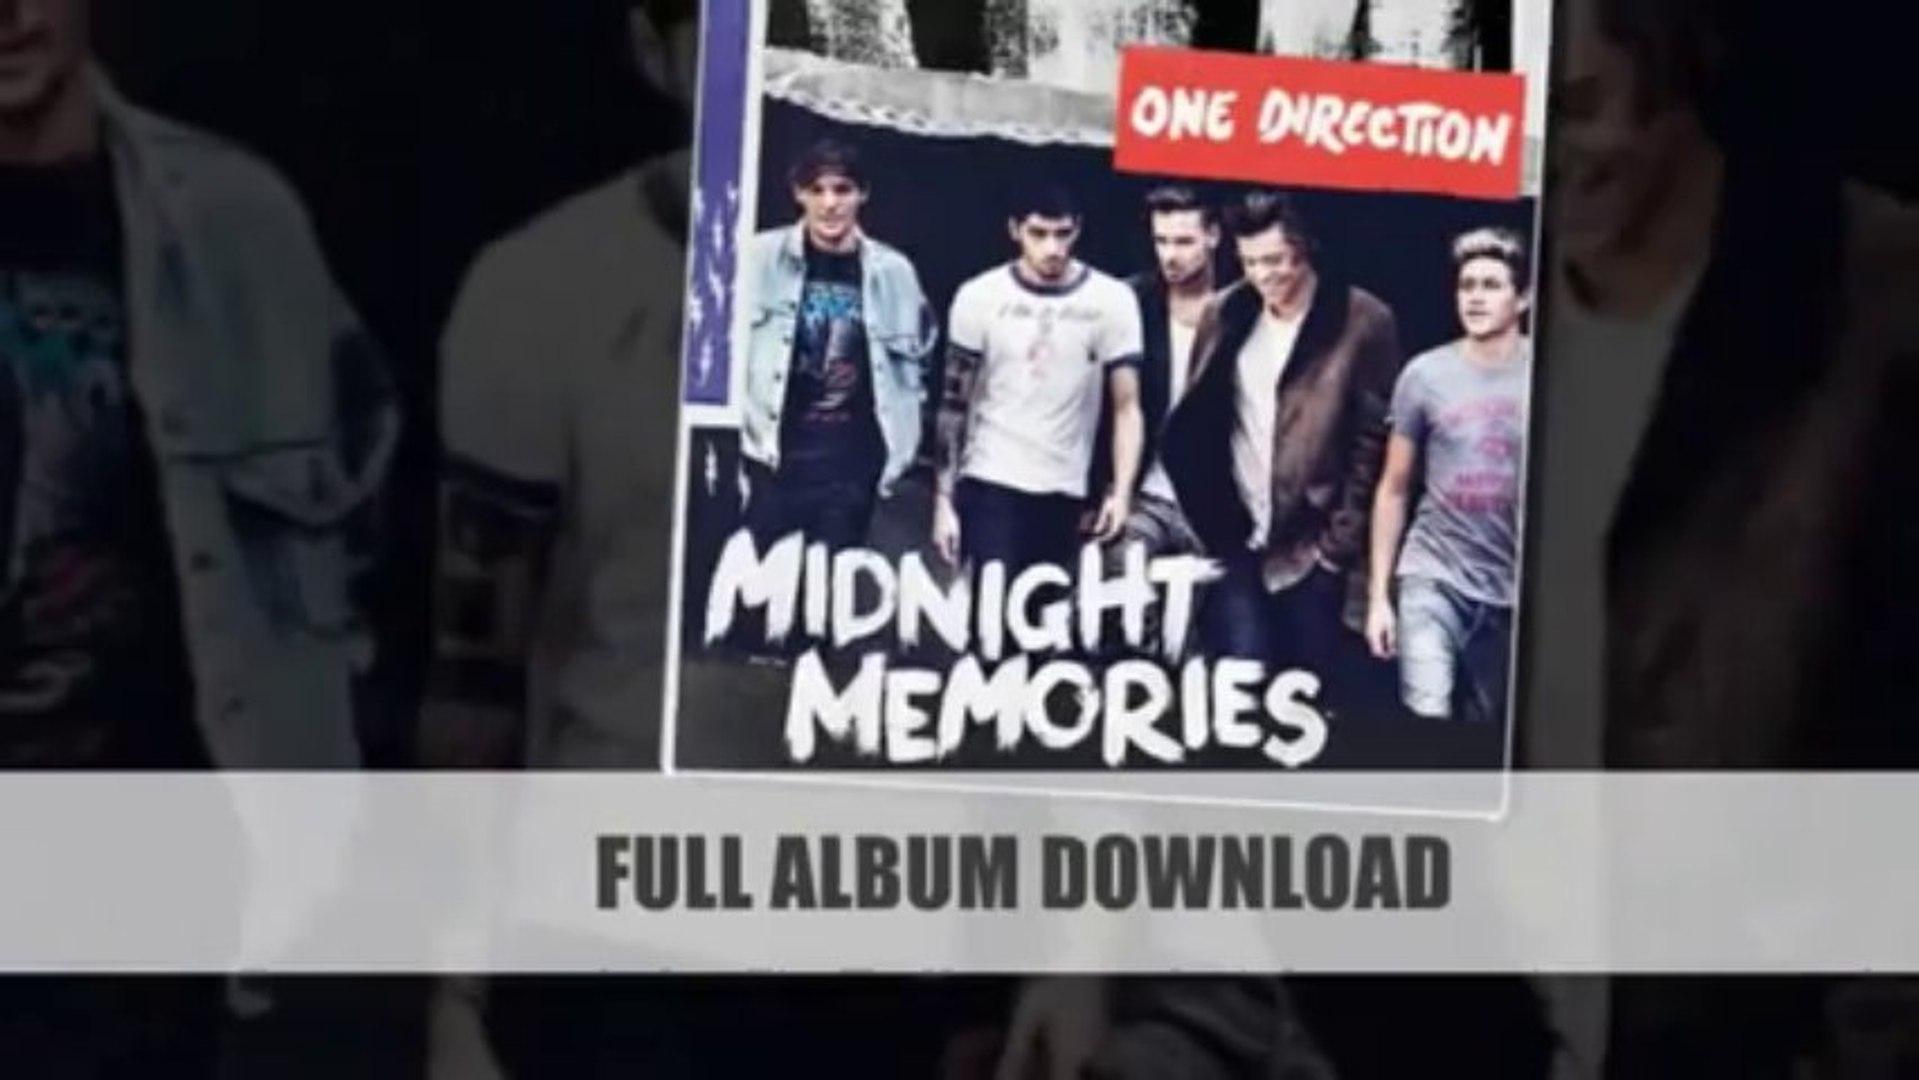 Midnight Memories Download - One Direction Full Album